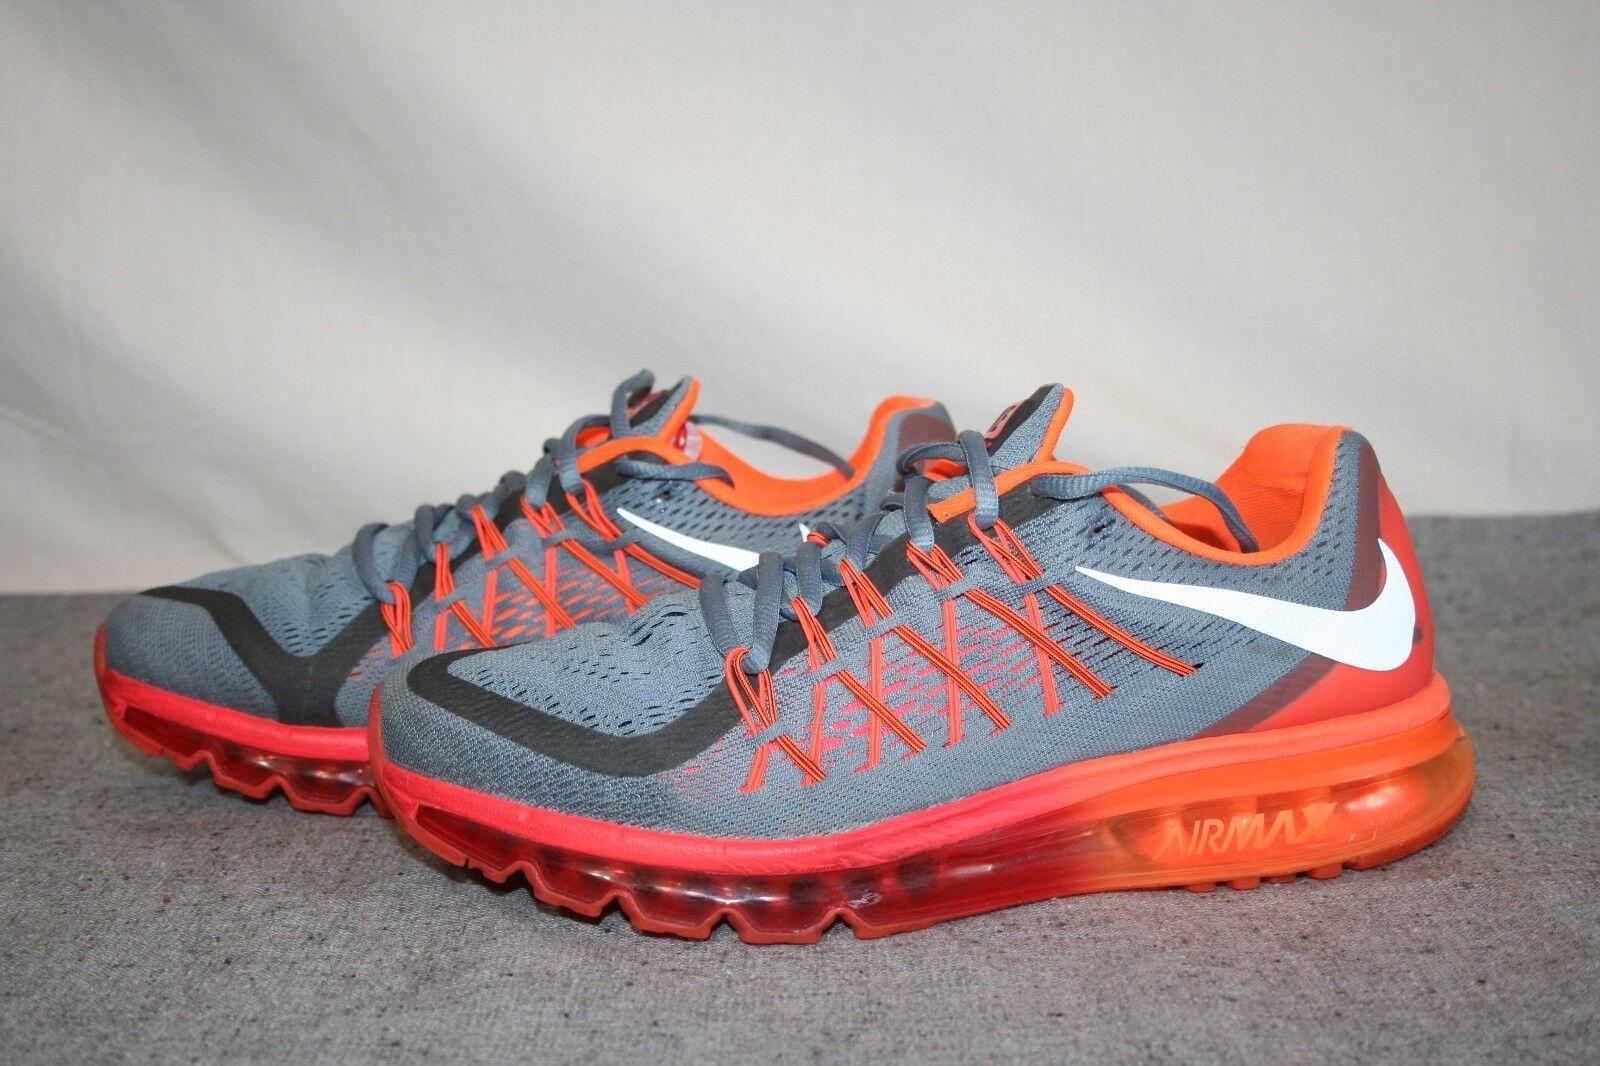 Nike Air Max Running Shoes Gray/White/Orange Men's Comfortable